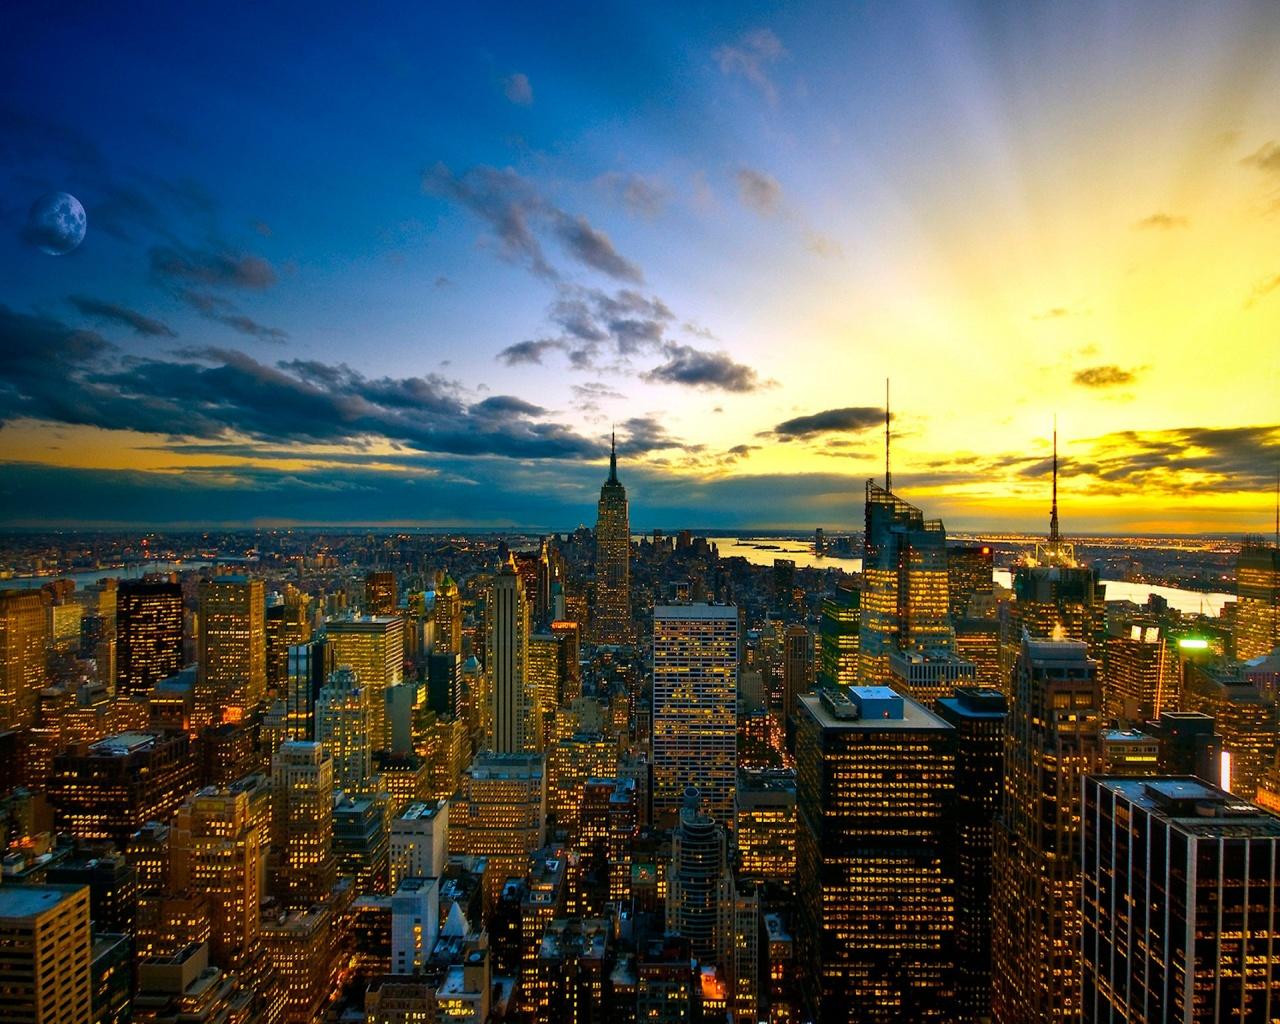 New York Cityscape Wallpaper   1280x1024 1280x1024